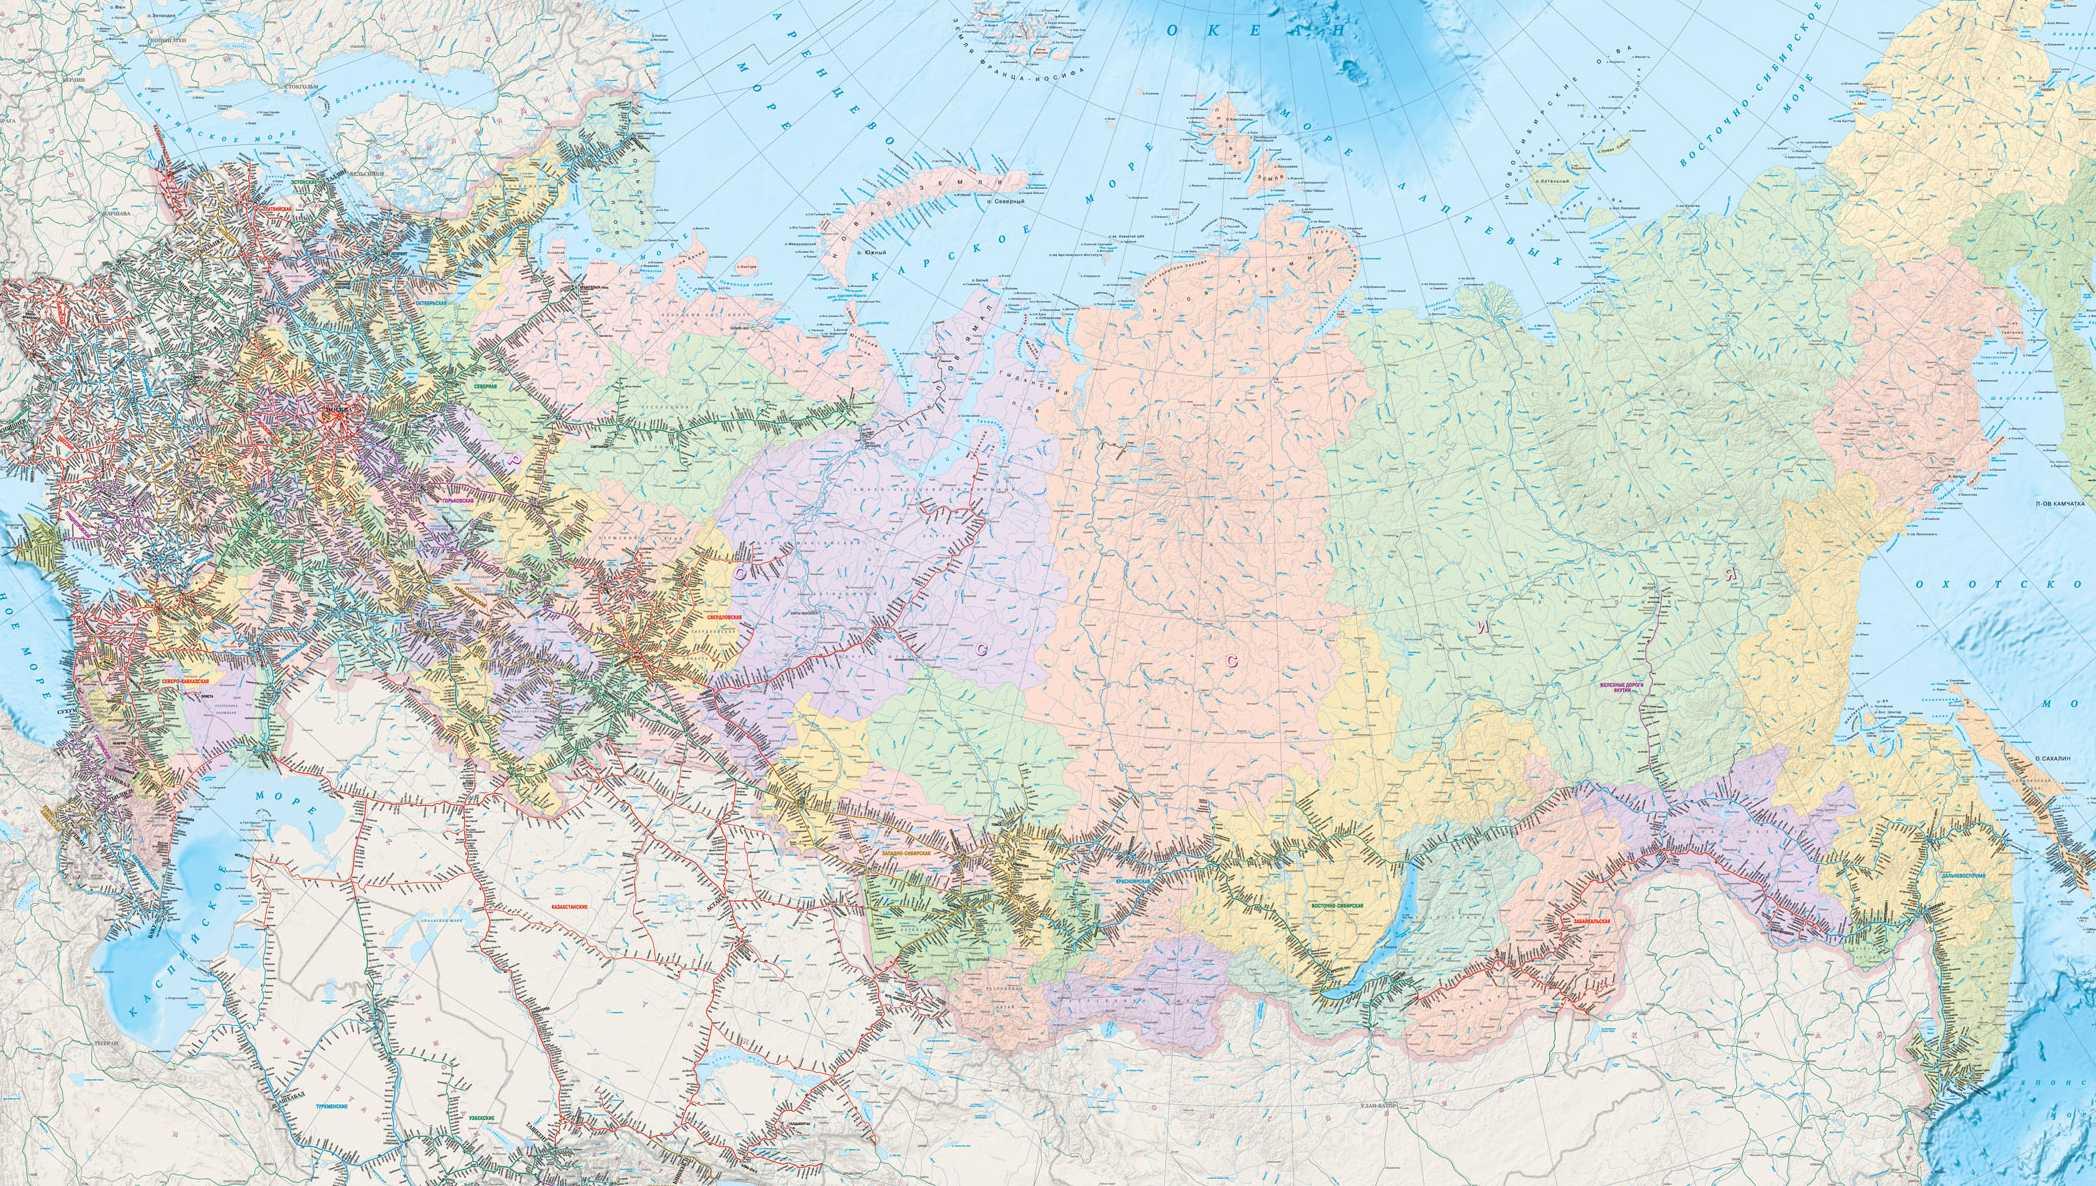 "<a href=""/map"">Карта ВЧДЭ</a>"